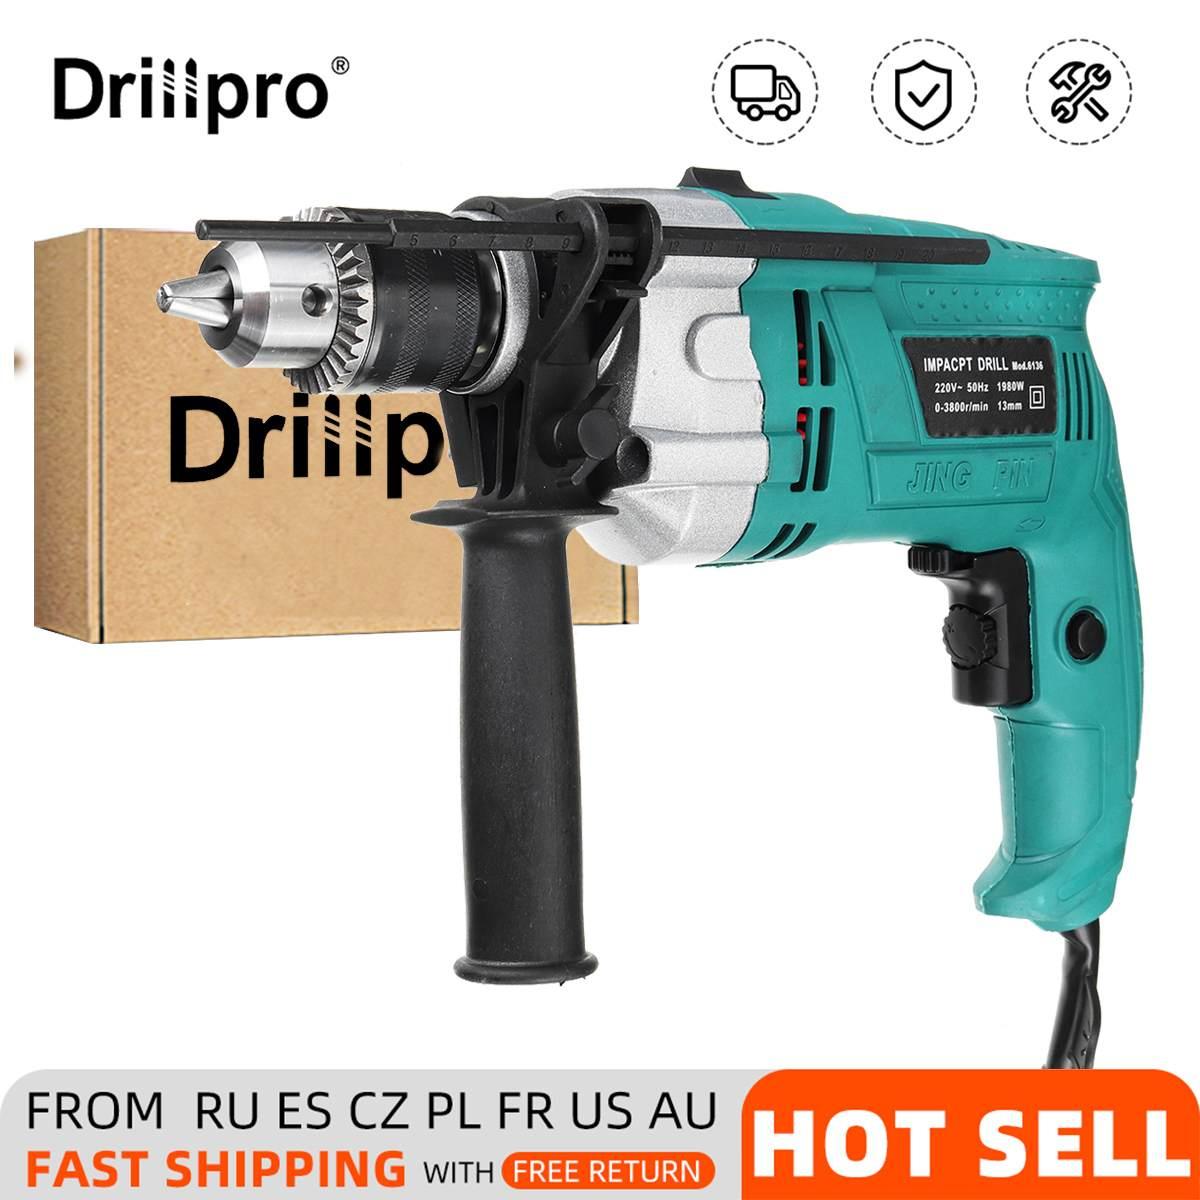 Drillpro 1980 واط 3800 دورة في الدقيقة 220 فولت حفار كهربائي دقاق عدة يده حفر مسطح مطرقة دورانية متعددة الوظائف مقياس وجع مقود